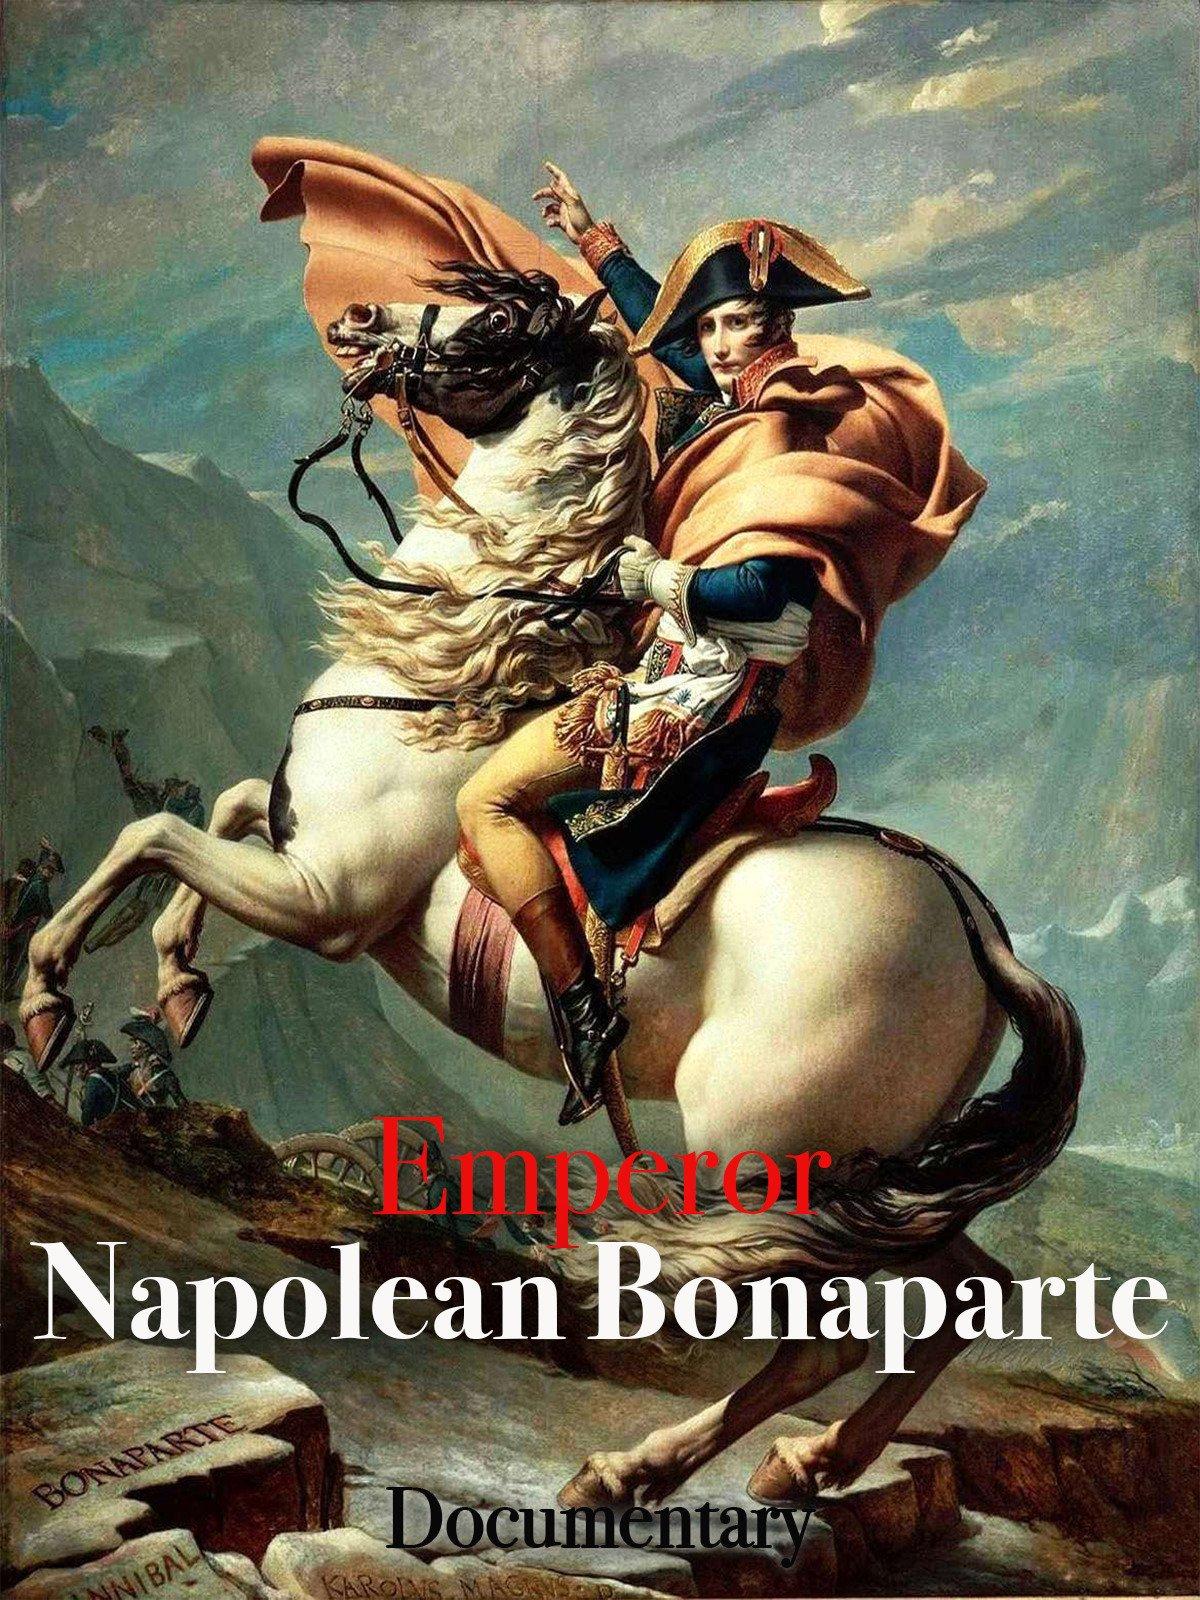 Emperor Napoleon Bonaparte Documentary